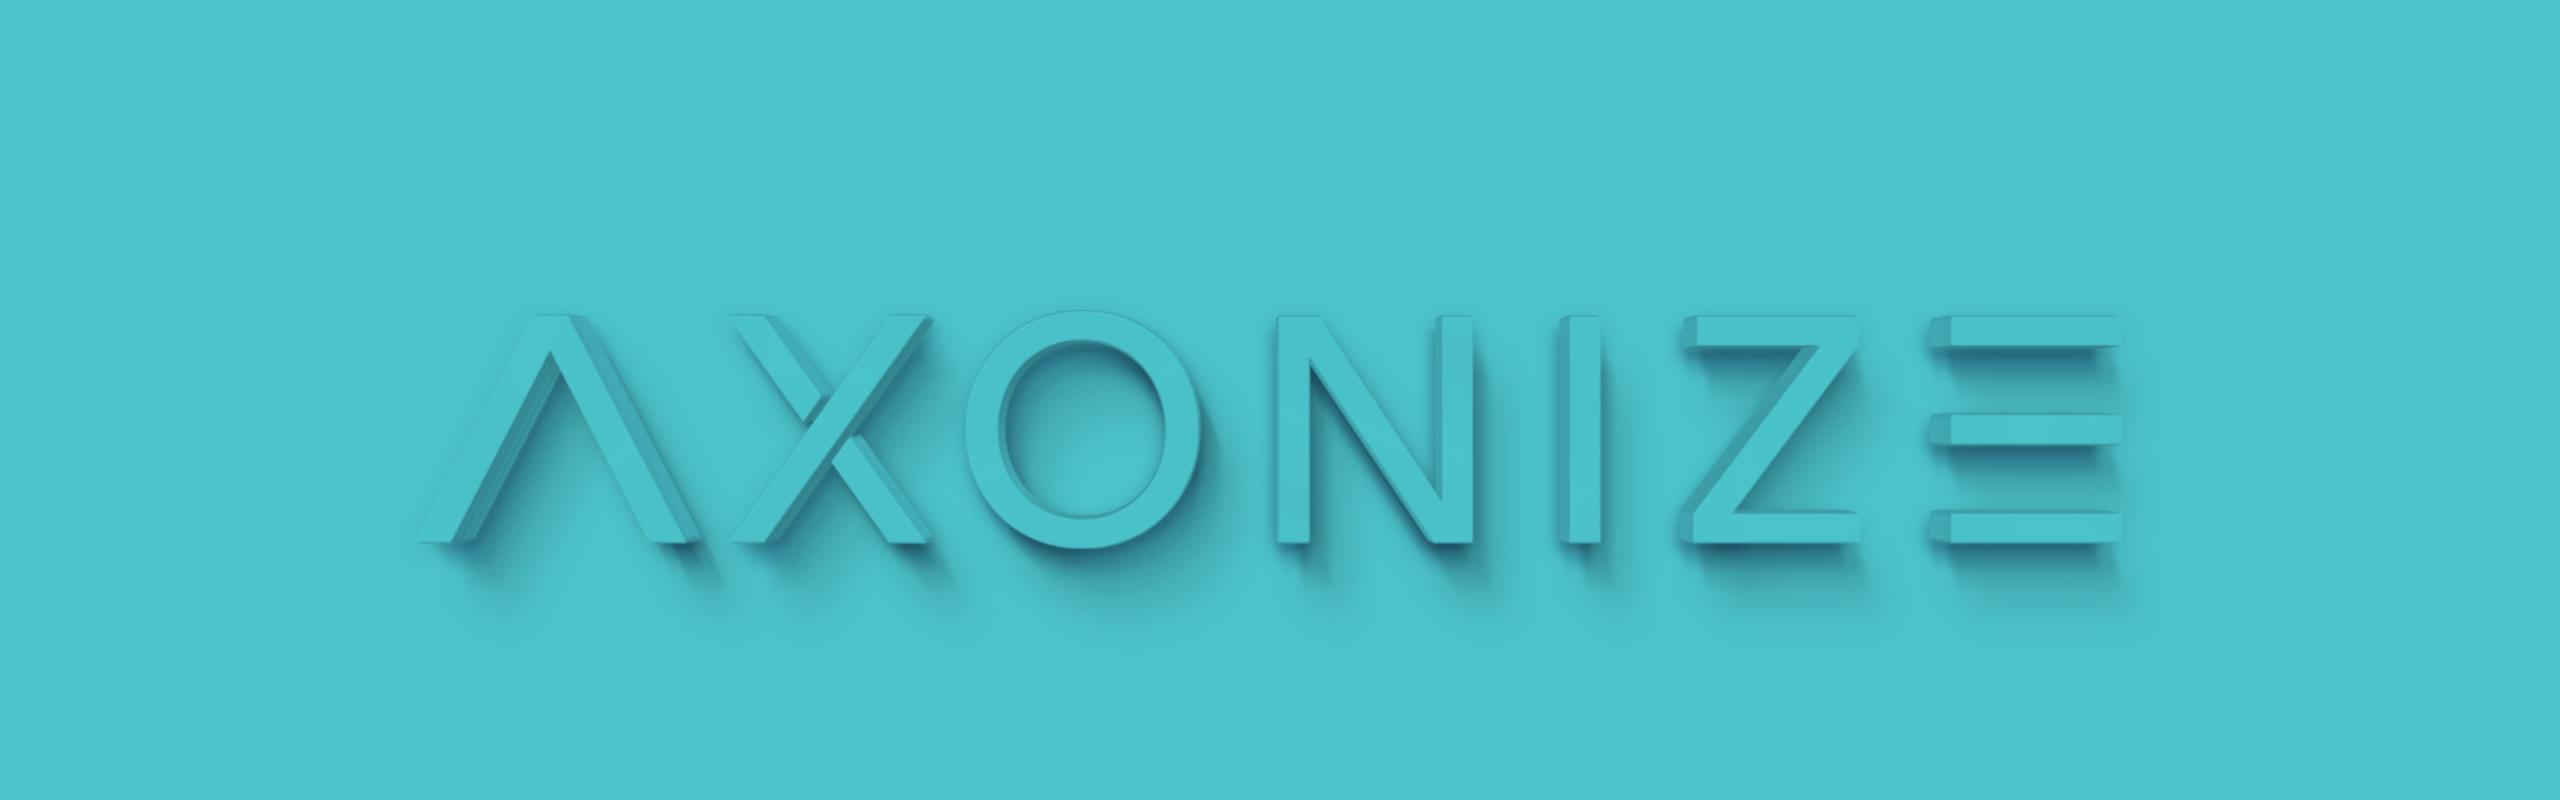 axonize-defblog-2560